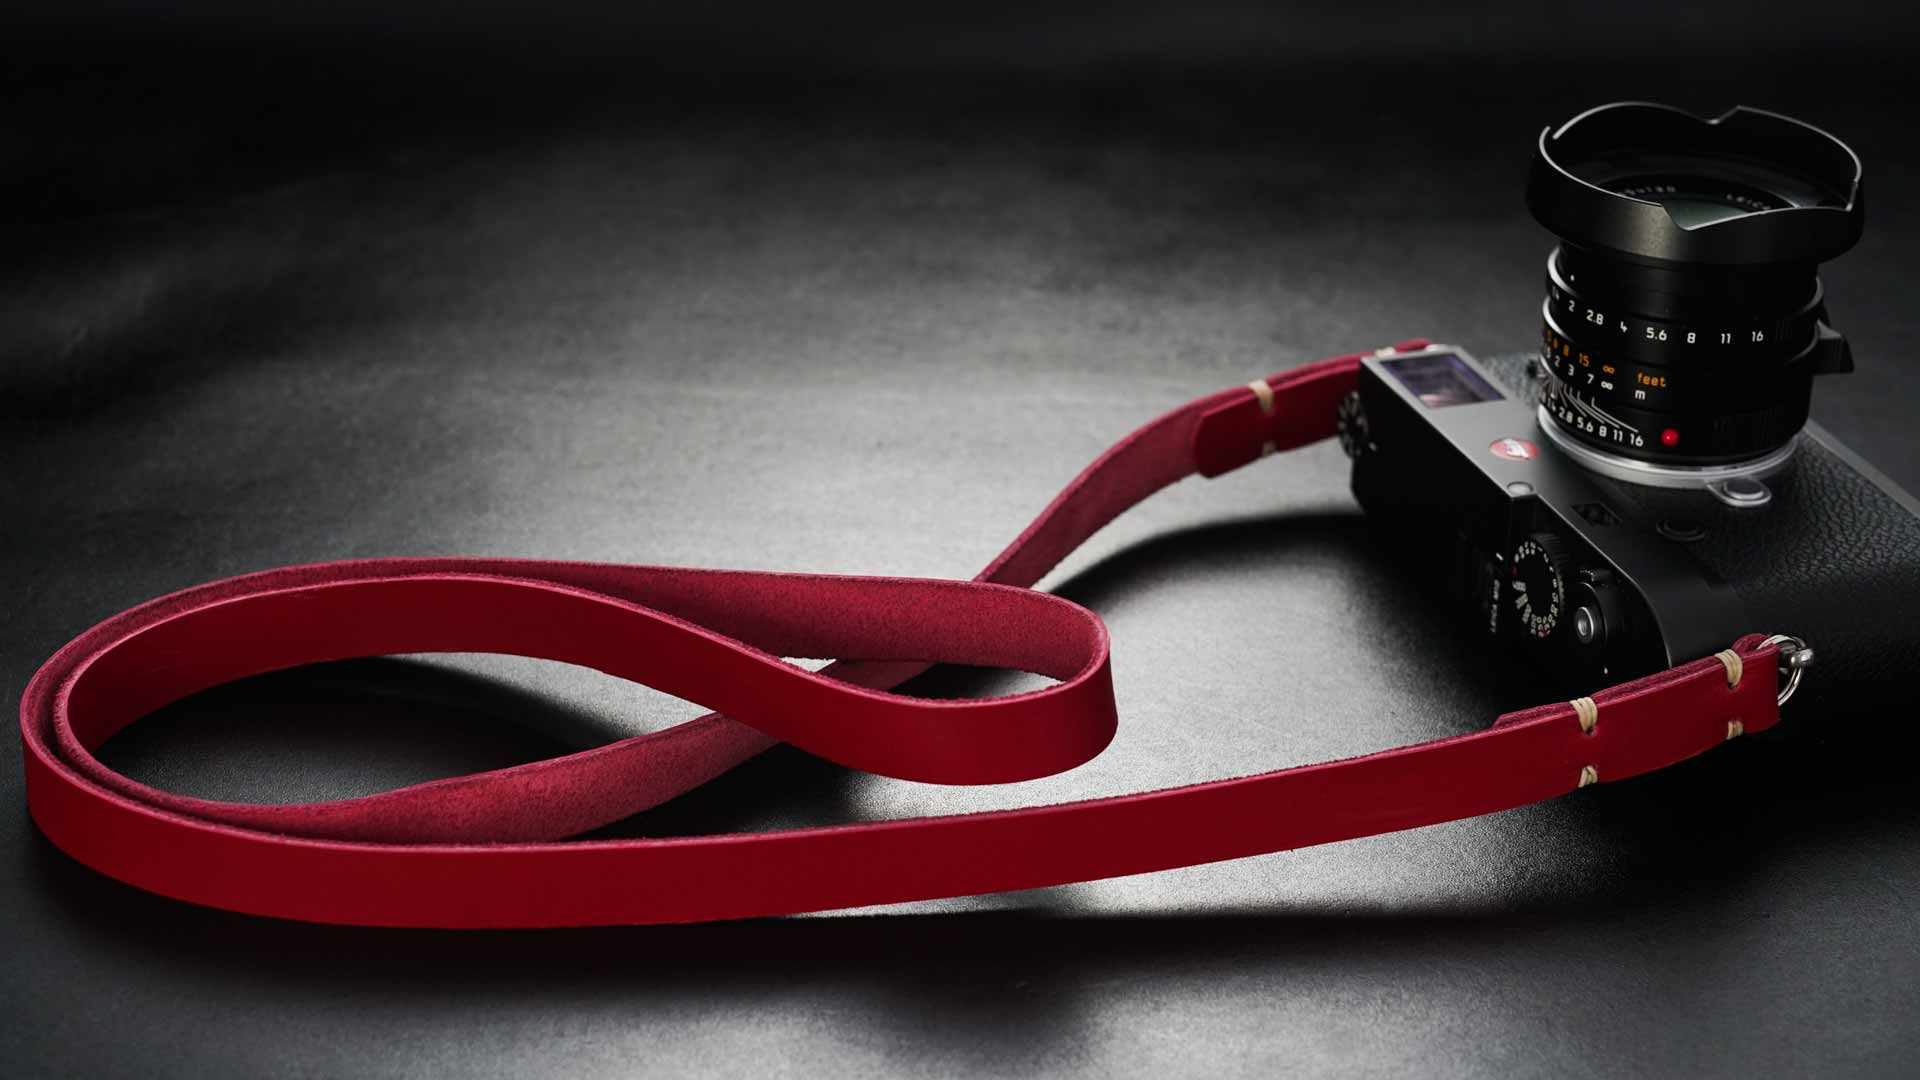 classic strap, leather camera strap, handmade leather camera strap, leica camera strap, mirrorless camera strap, handmade camera strap, dslr camera strap, red camera strap